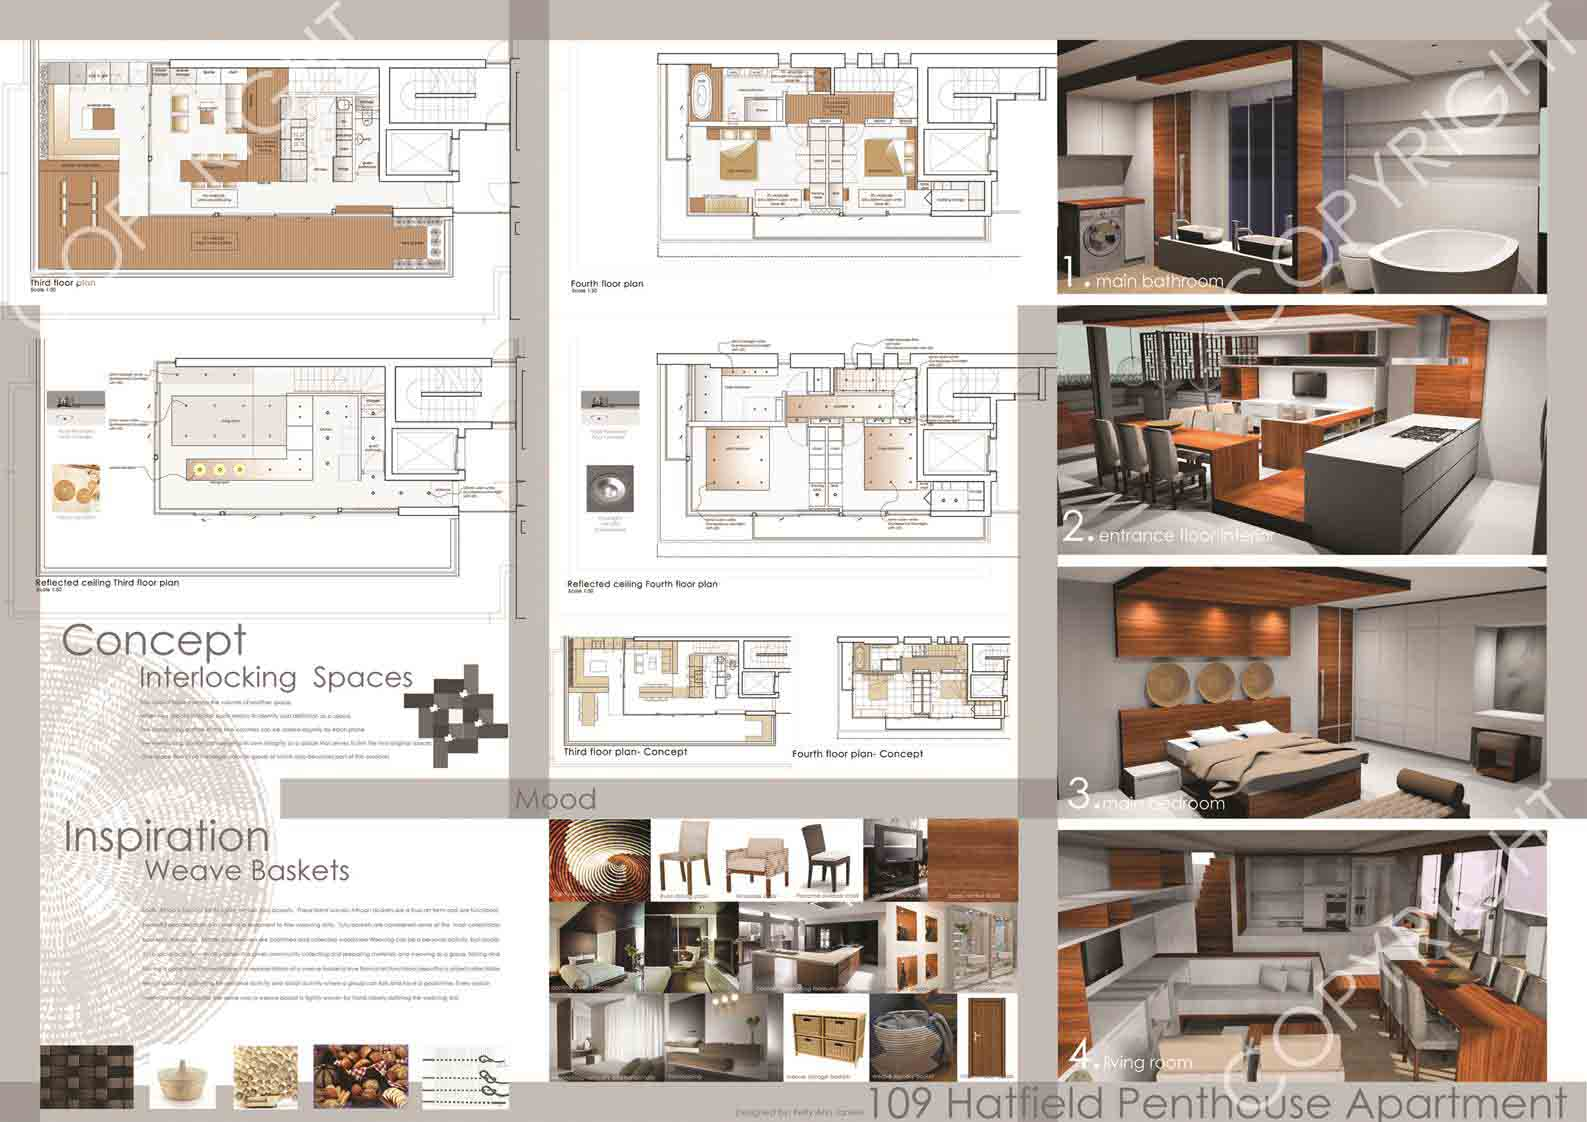 Interlocking spaces for Interlocking architecture concept